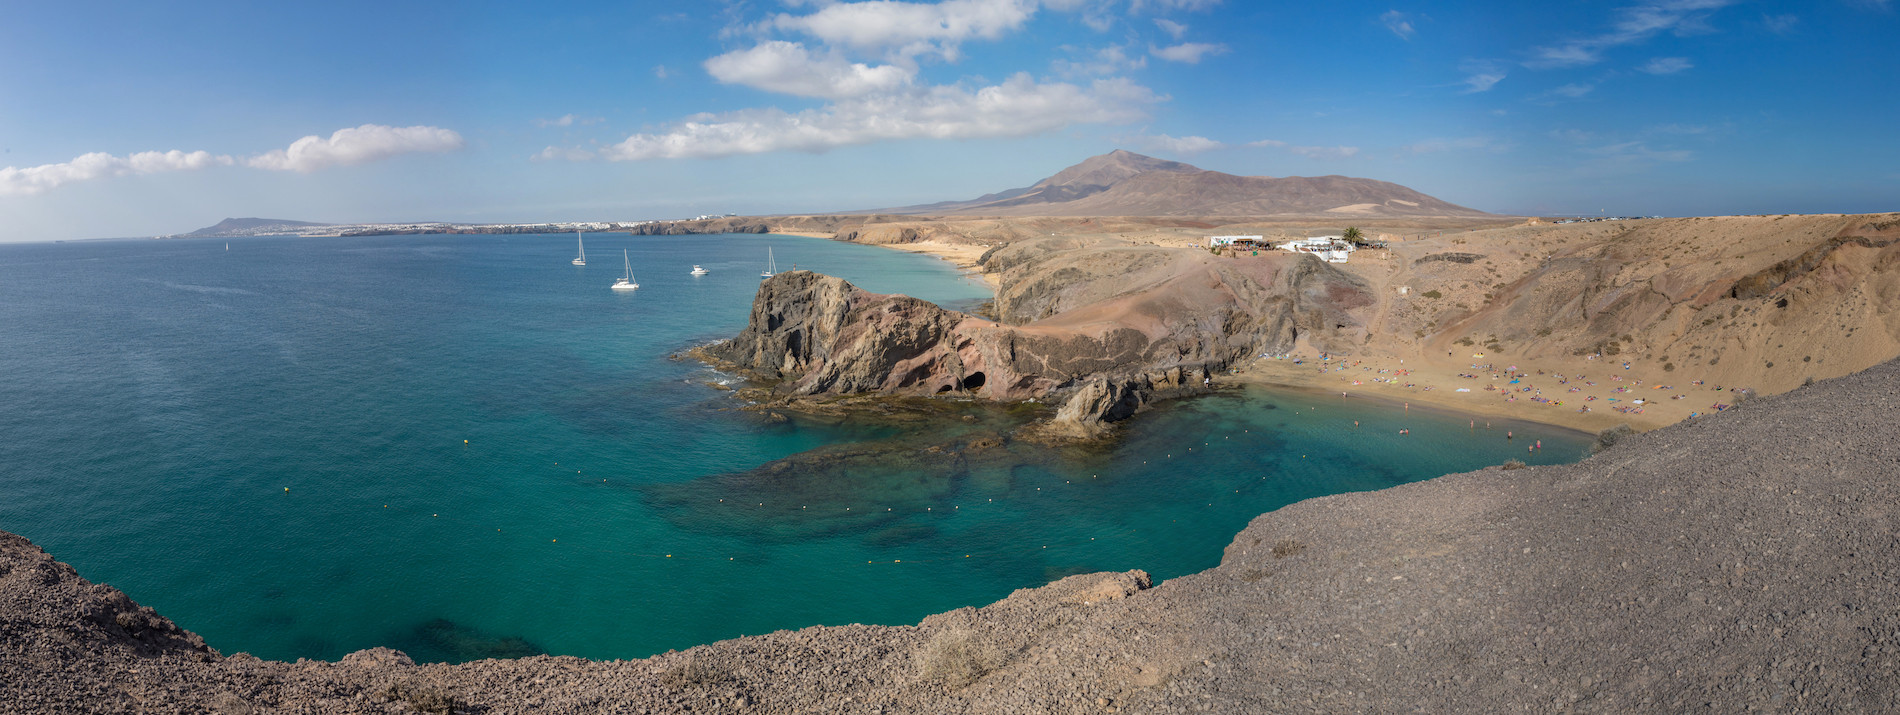 PHOTO Lanzarote Playa de Papa Gayo panoramique